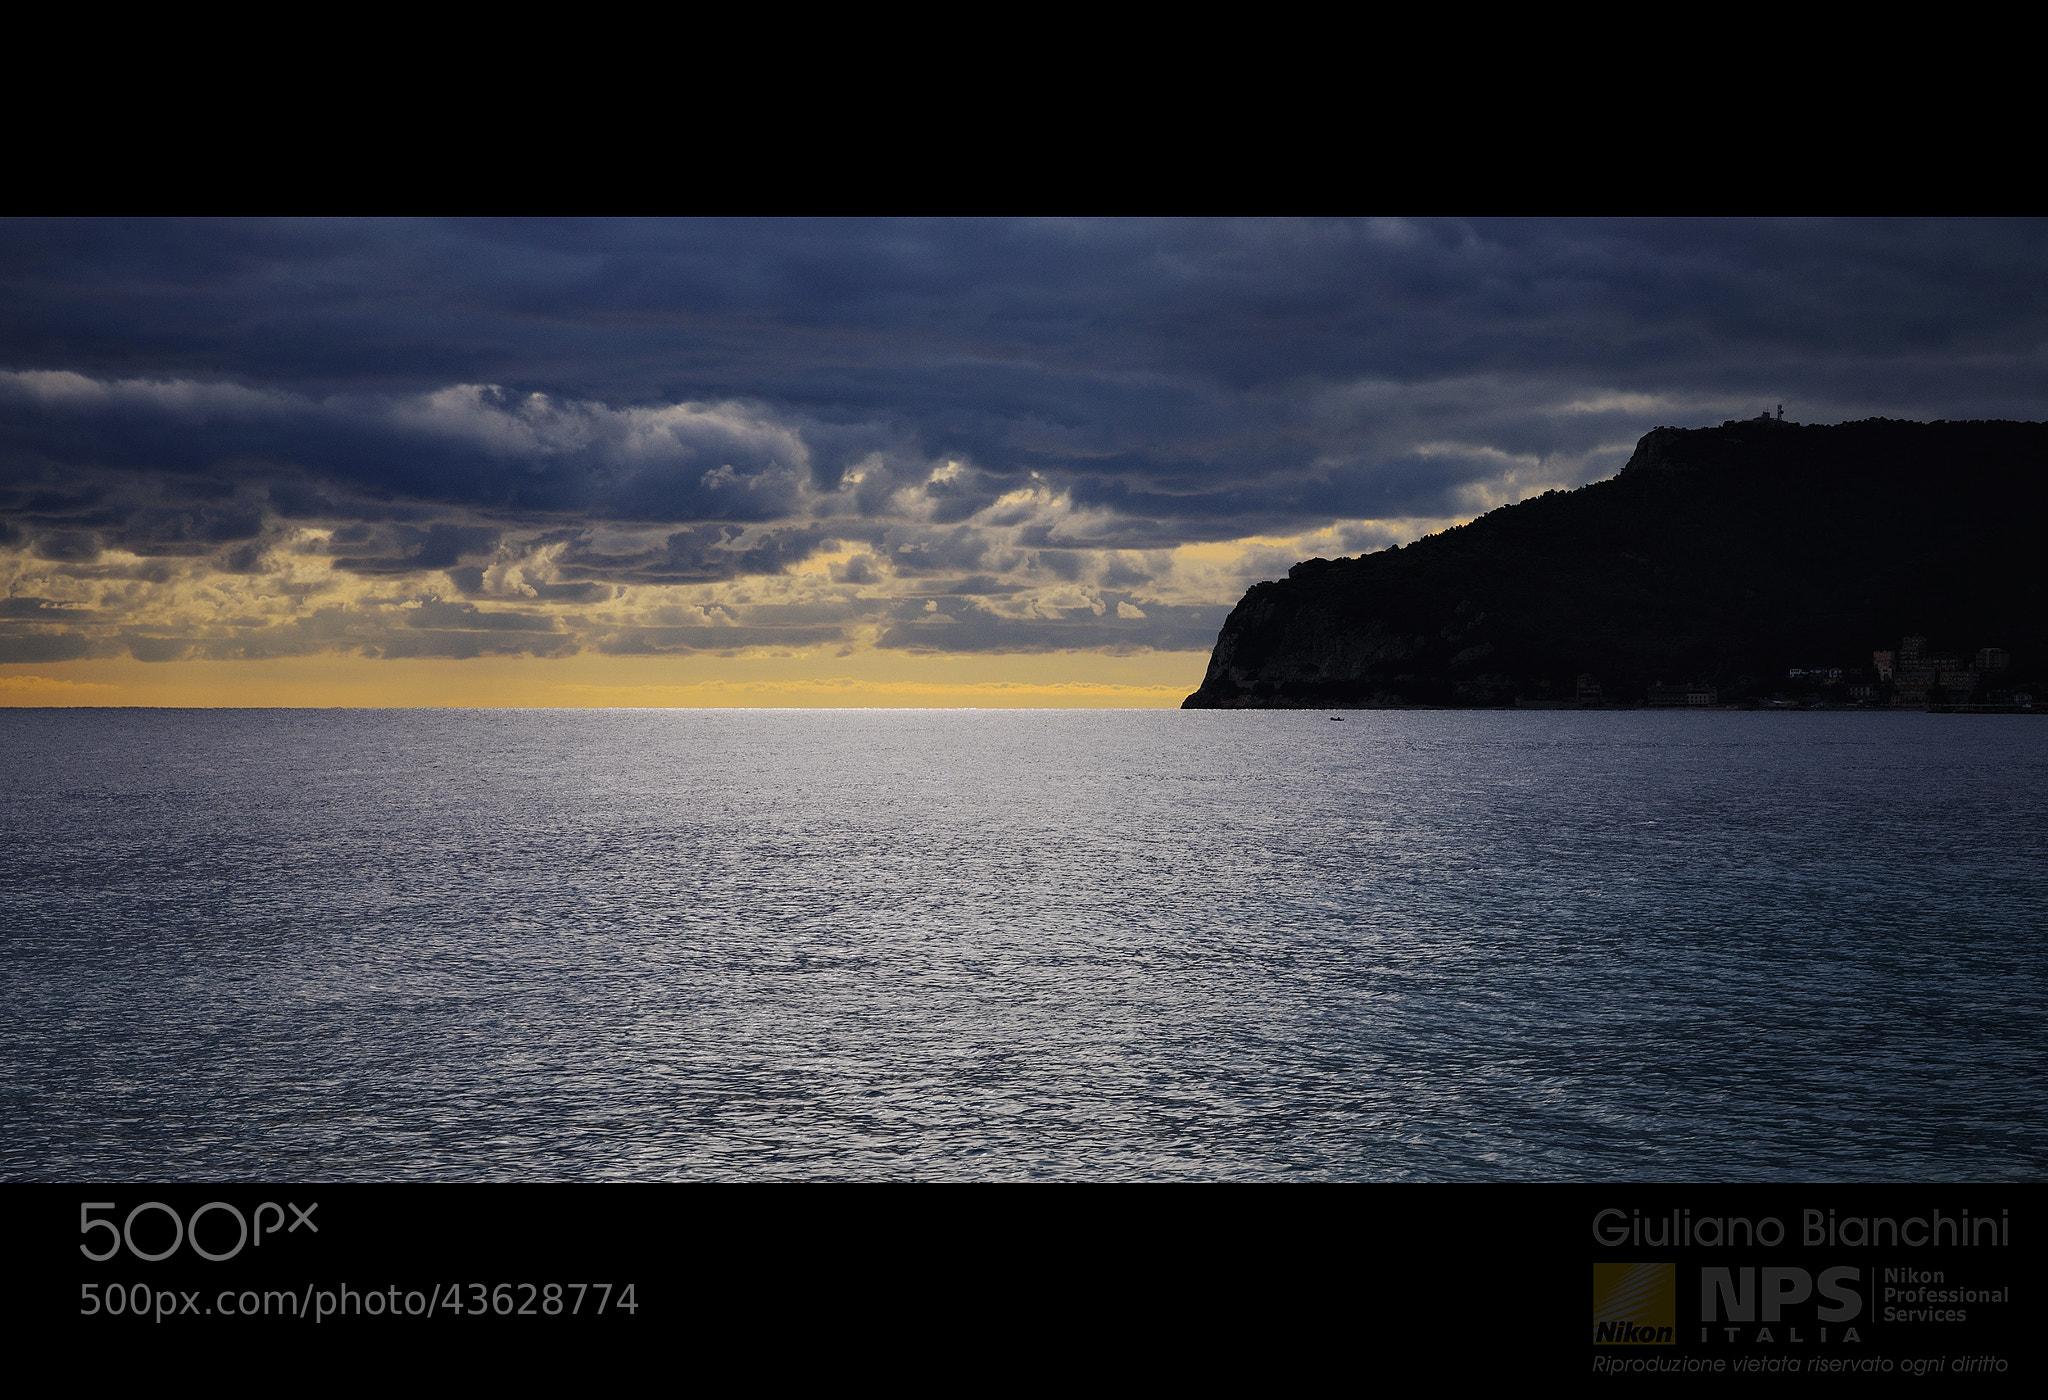 Photograph Liguria - Nikon D3x by Giuliano Bianchini on 500px